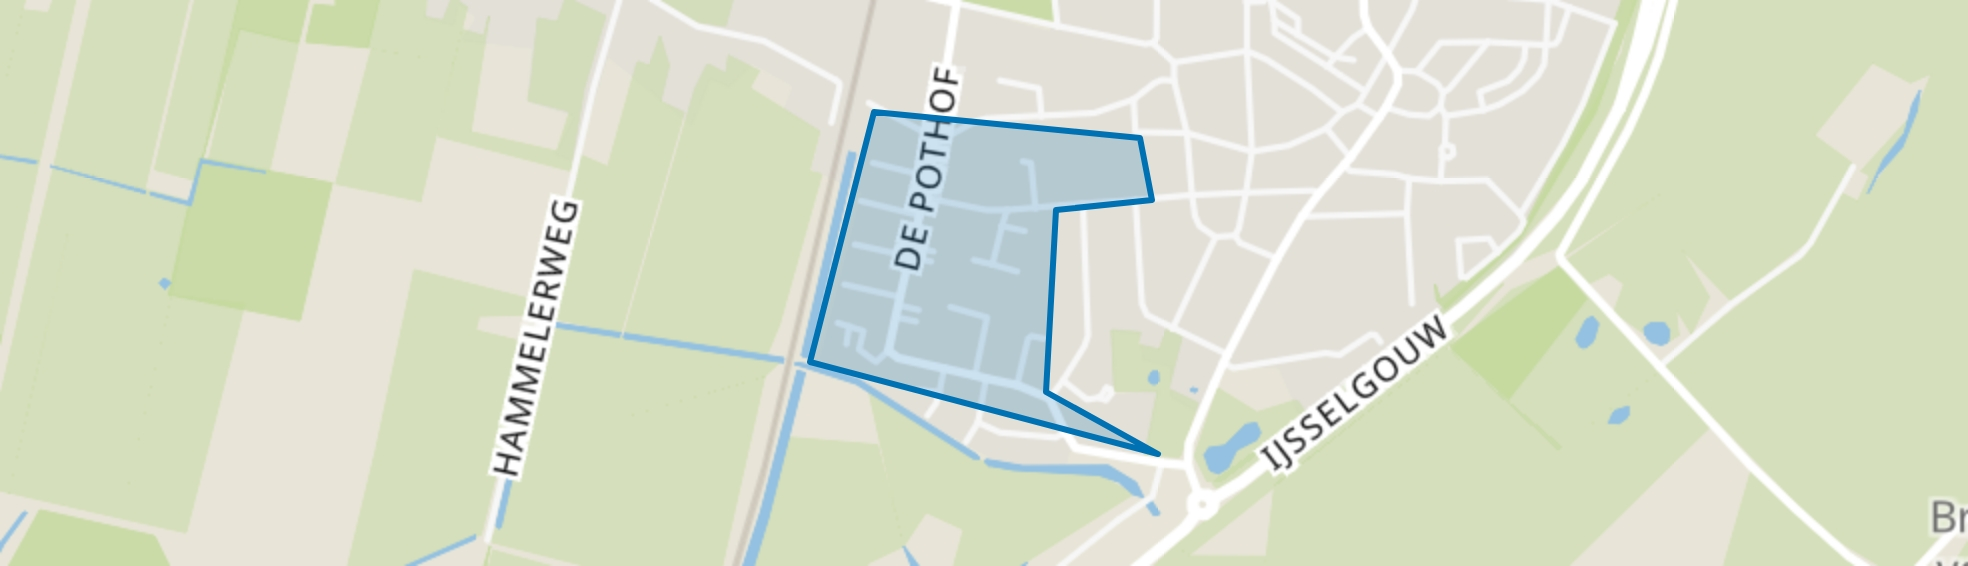 De Pothof, Brummen map